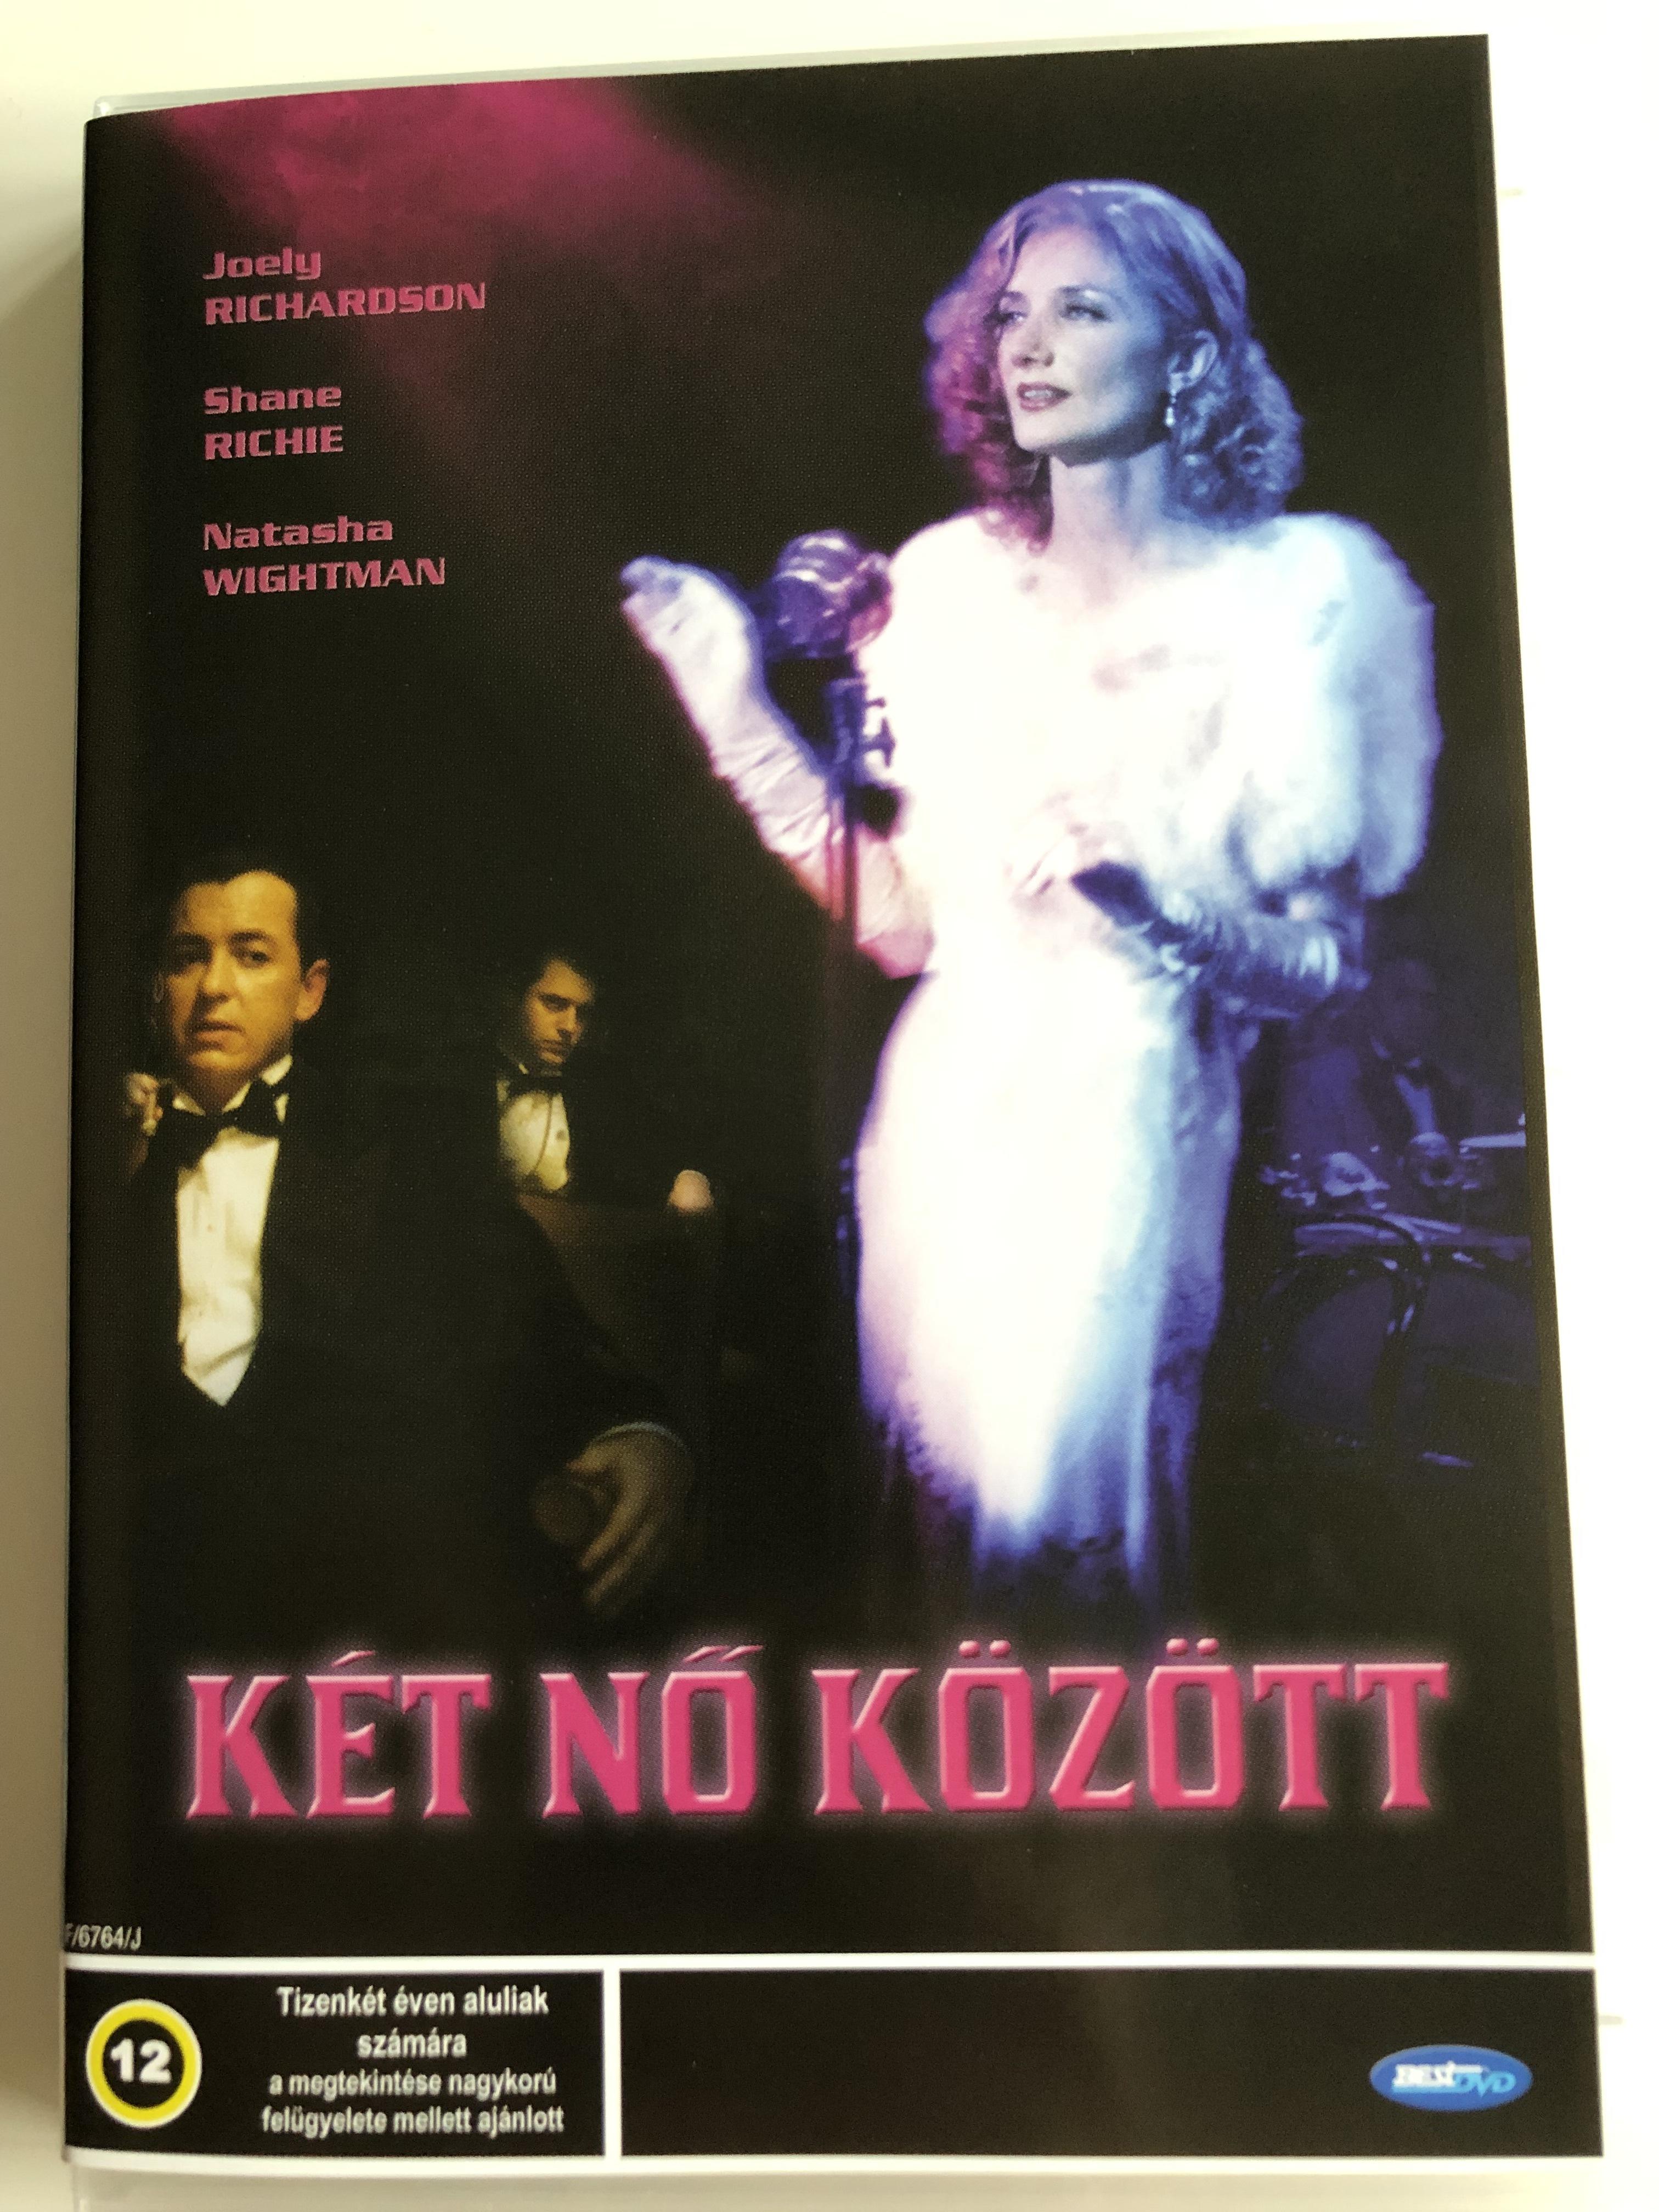 shoreditch-dvd-2003-k-t-n-k-z-tt-directed-by-malcolm-needs-starring-joely-richardson-shane-richie-natasha-wightman-1-.jpg